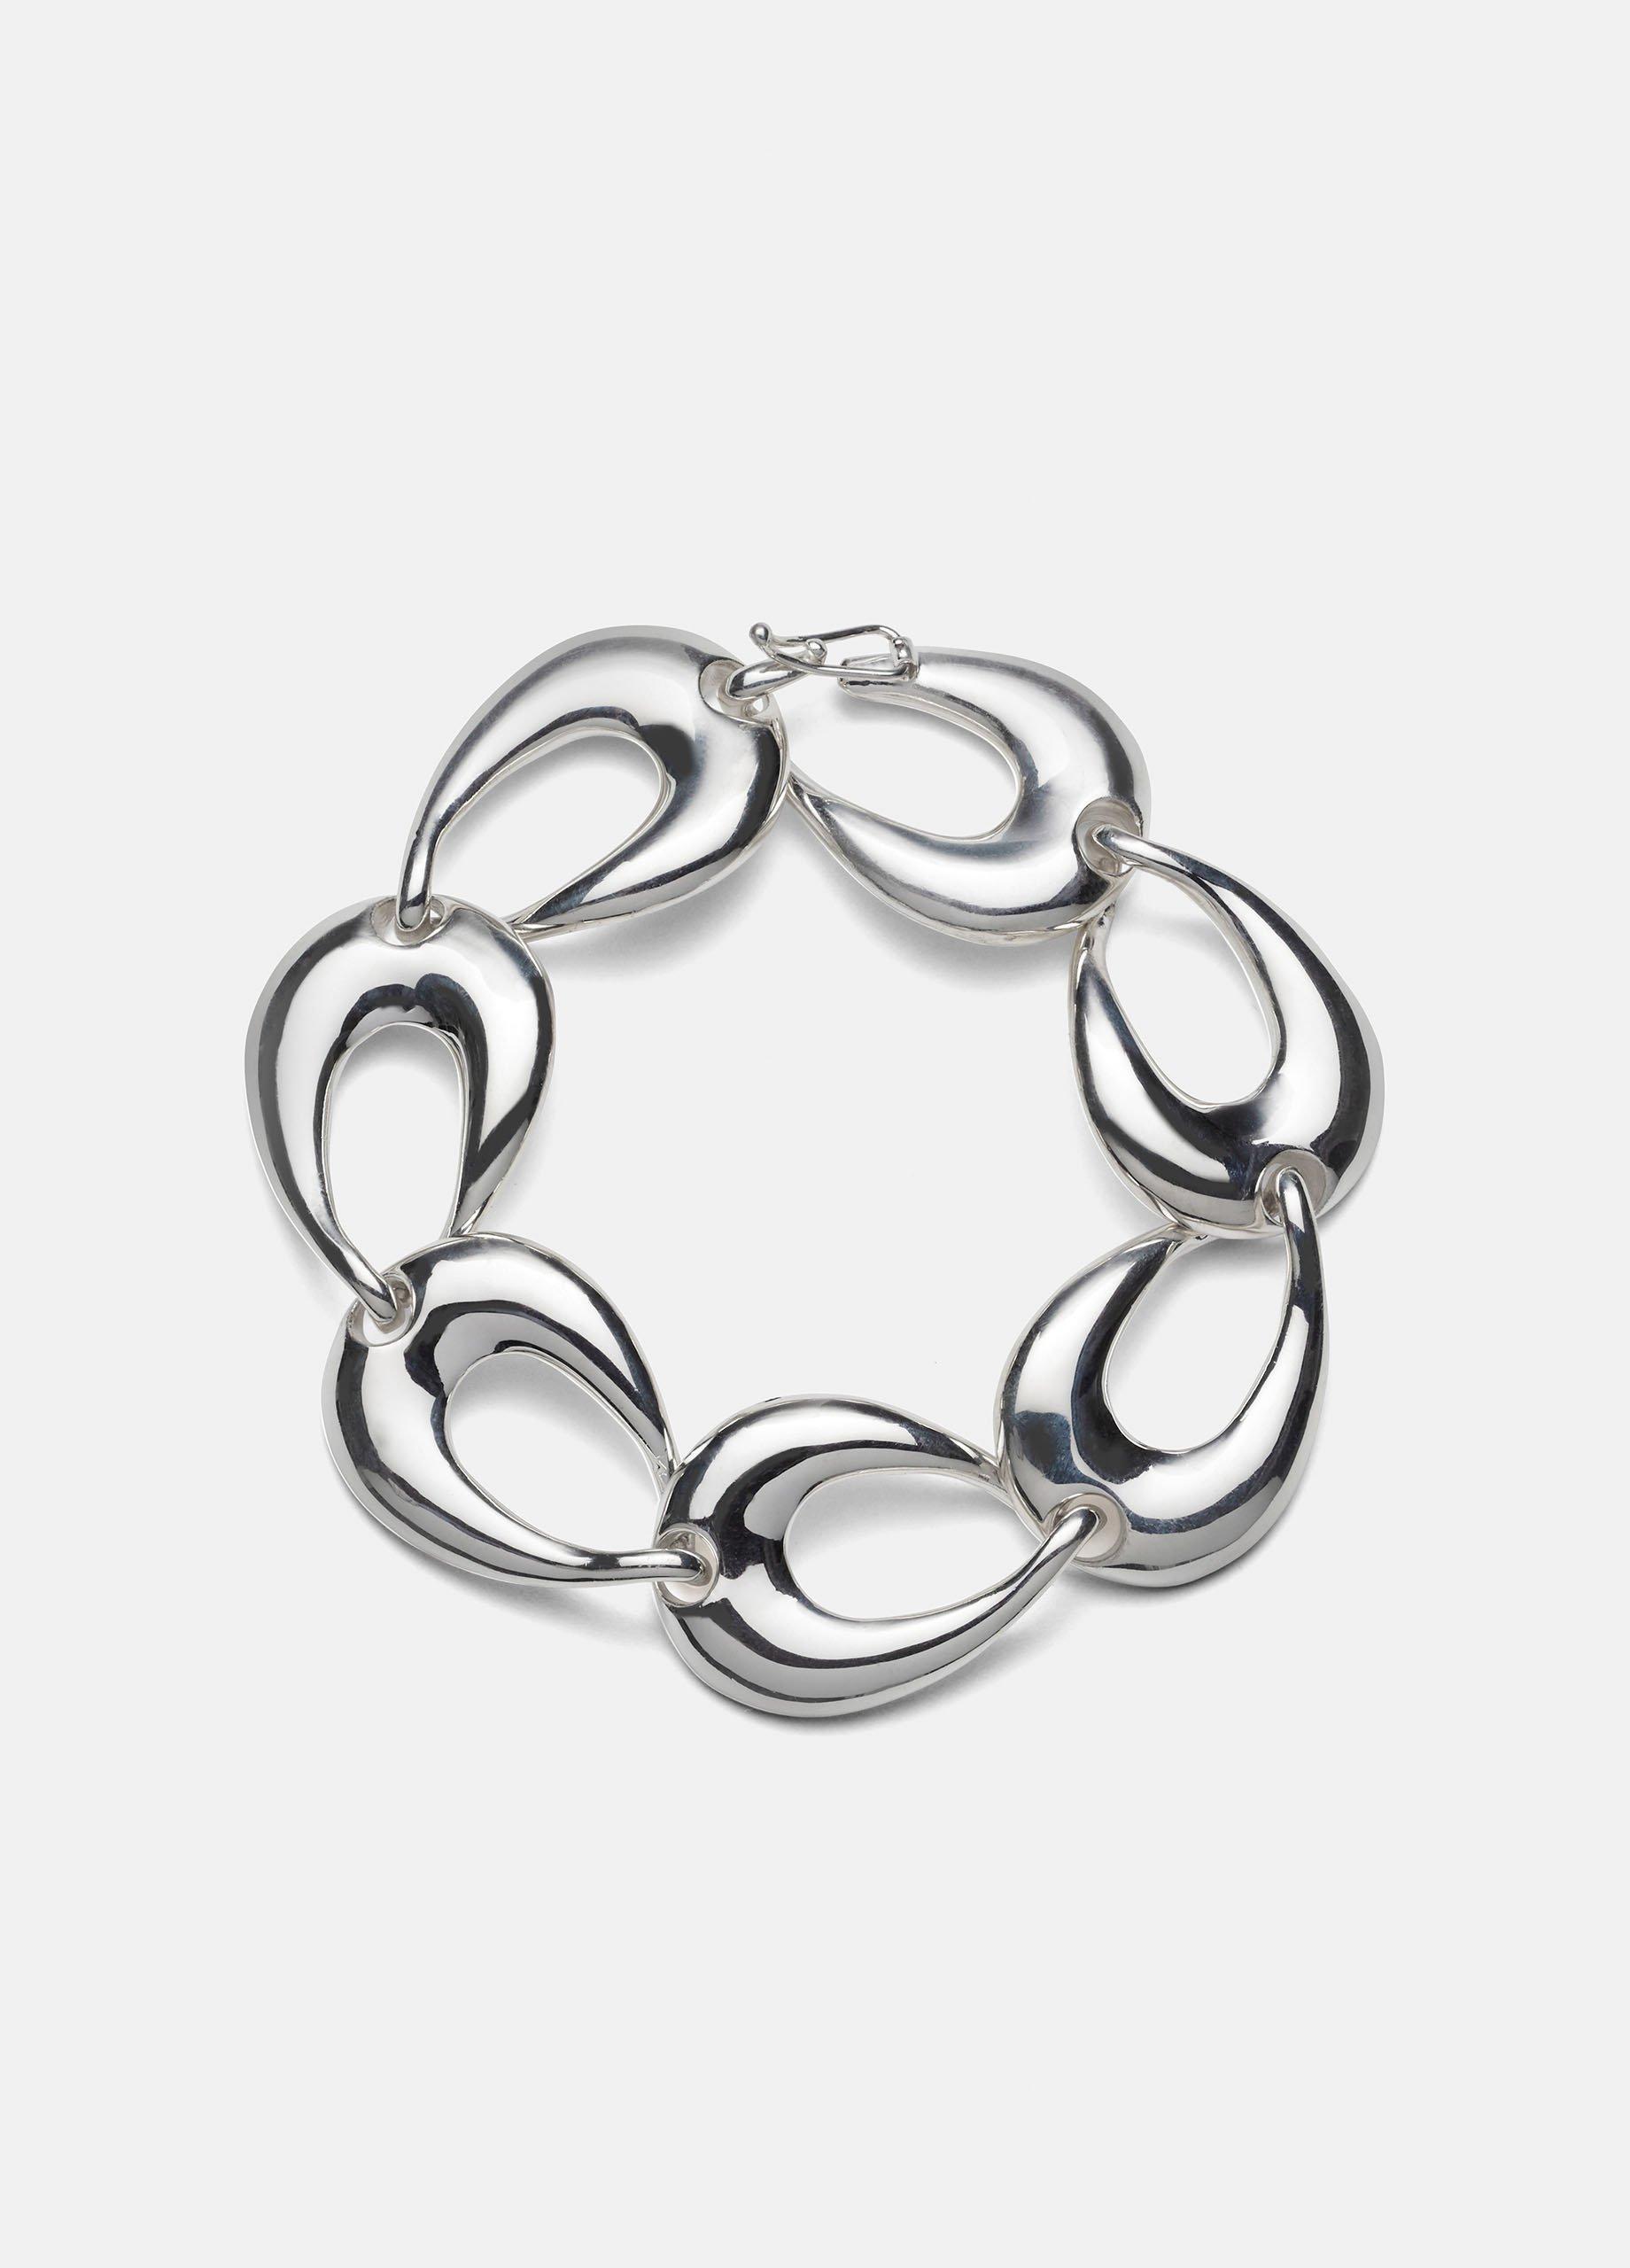 AGMES / Tilda Bracelet